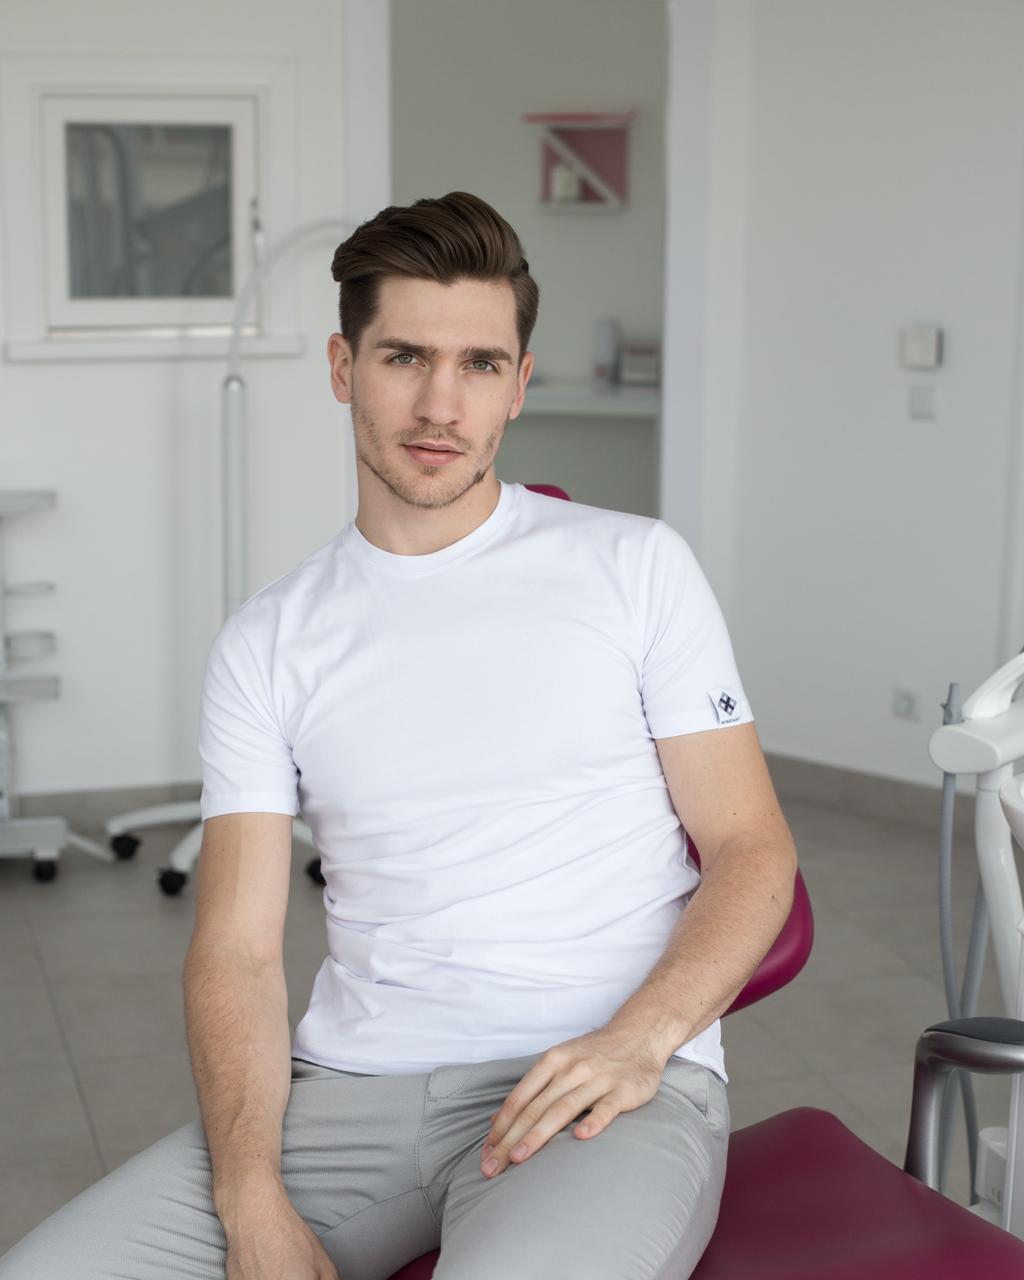 Мужская медицинская футболка, белая